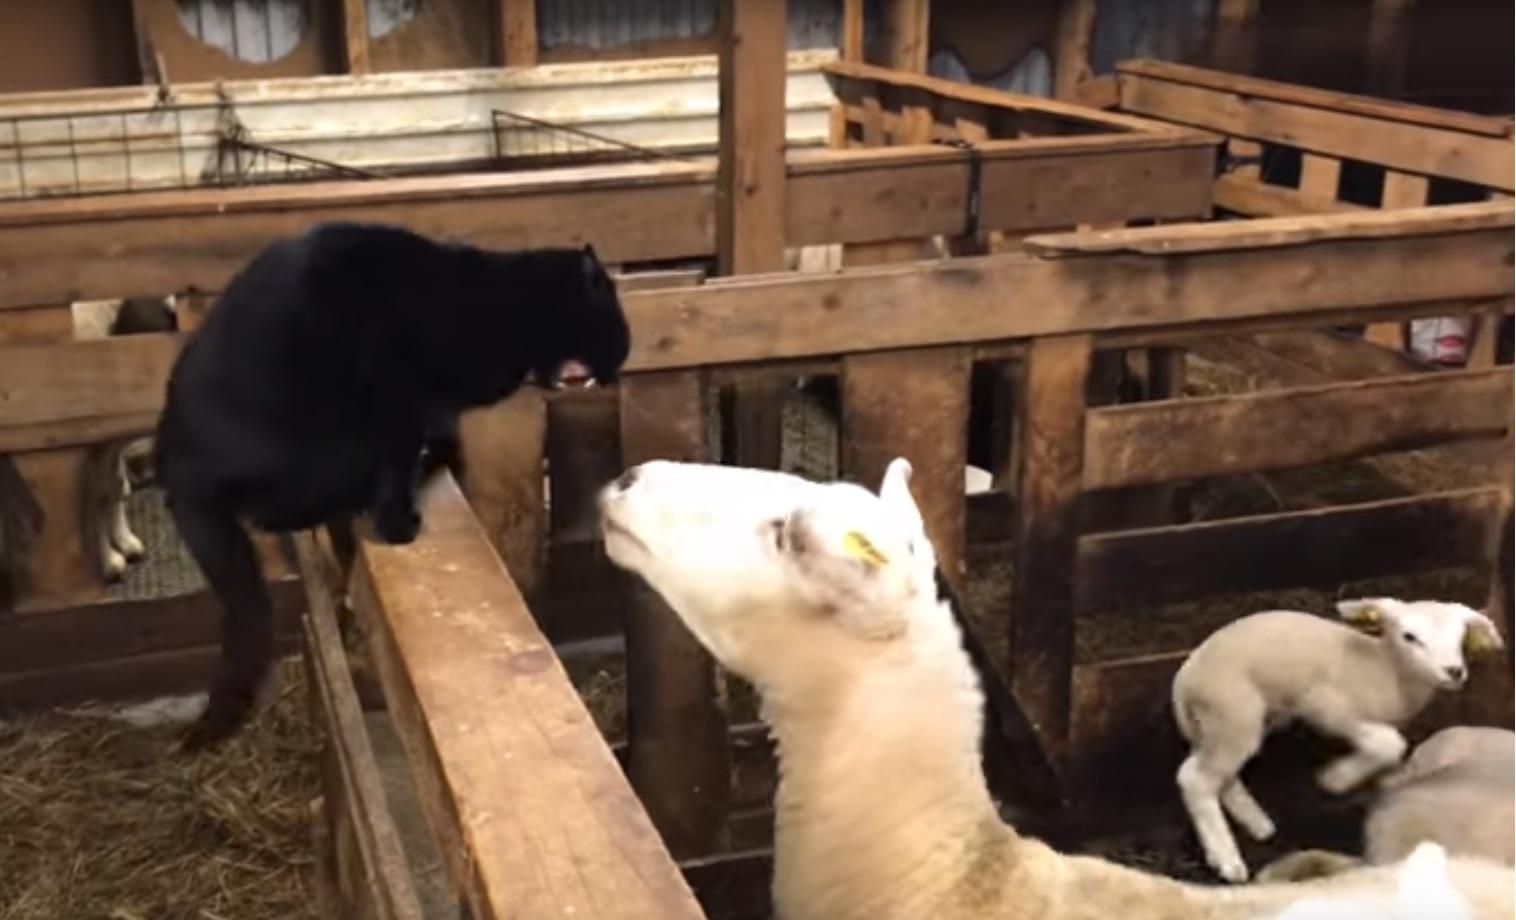 Sheep versus cat